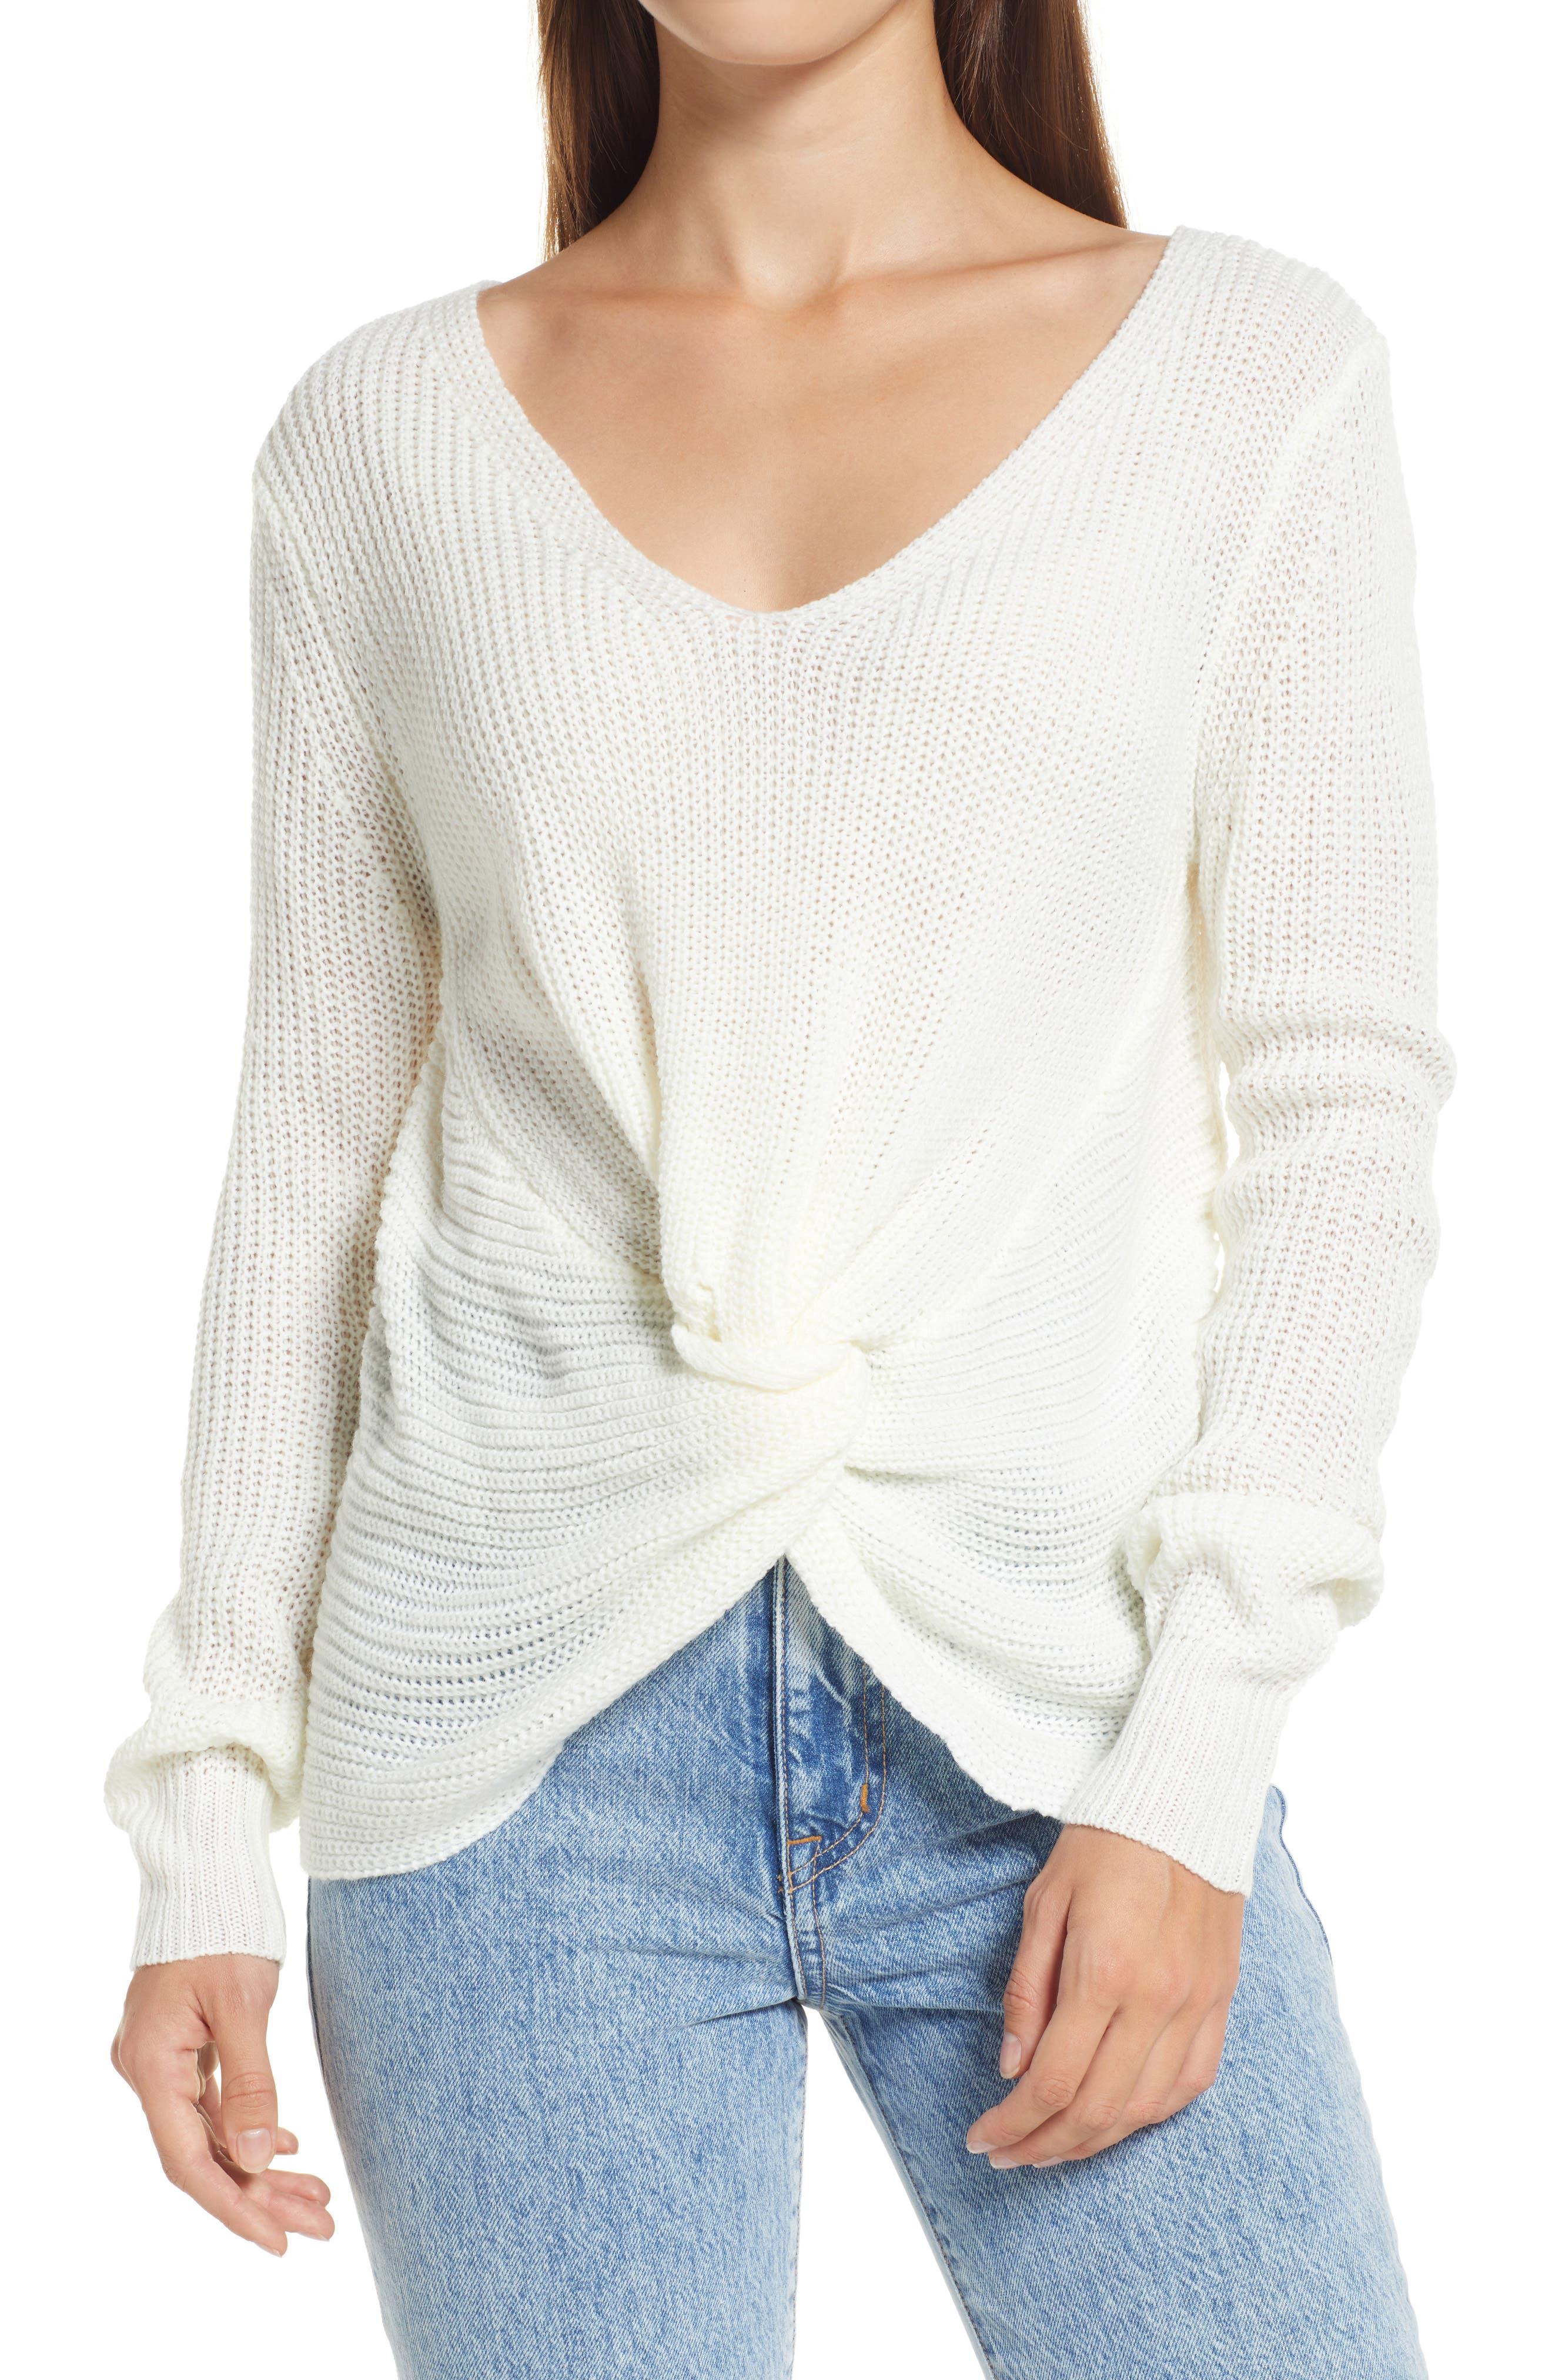 Mood Booster Ivory Knit Twist Sweater